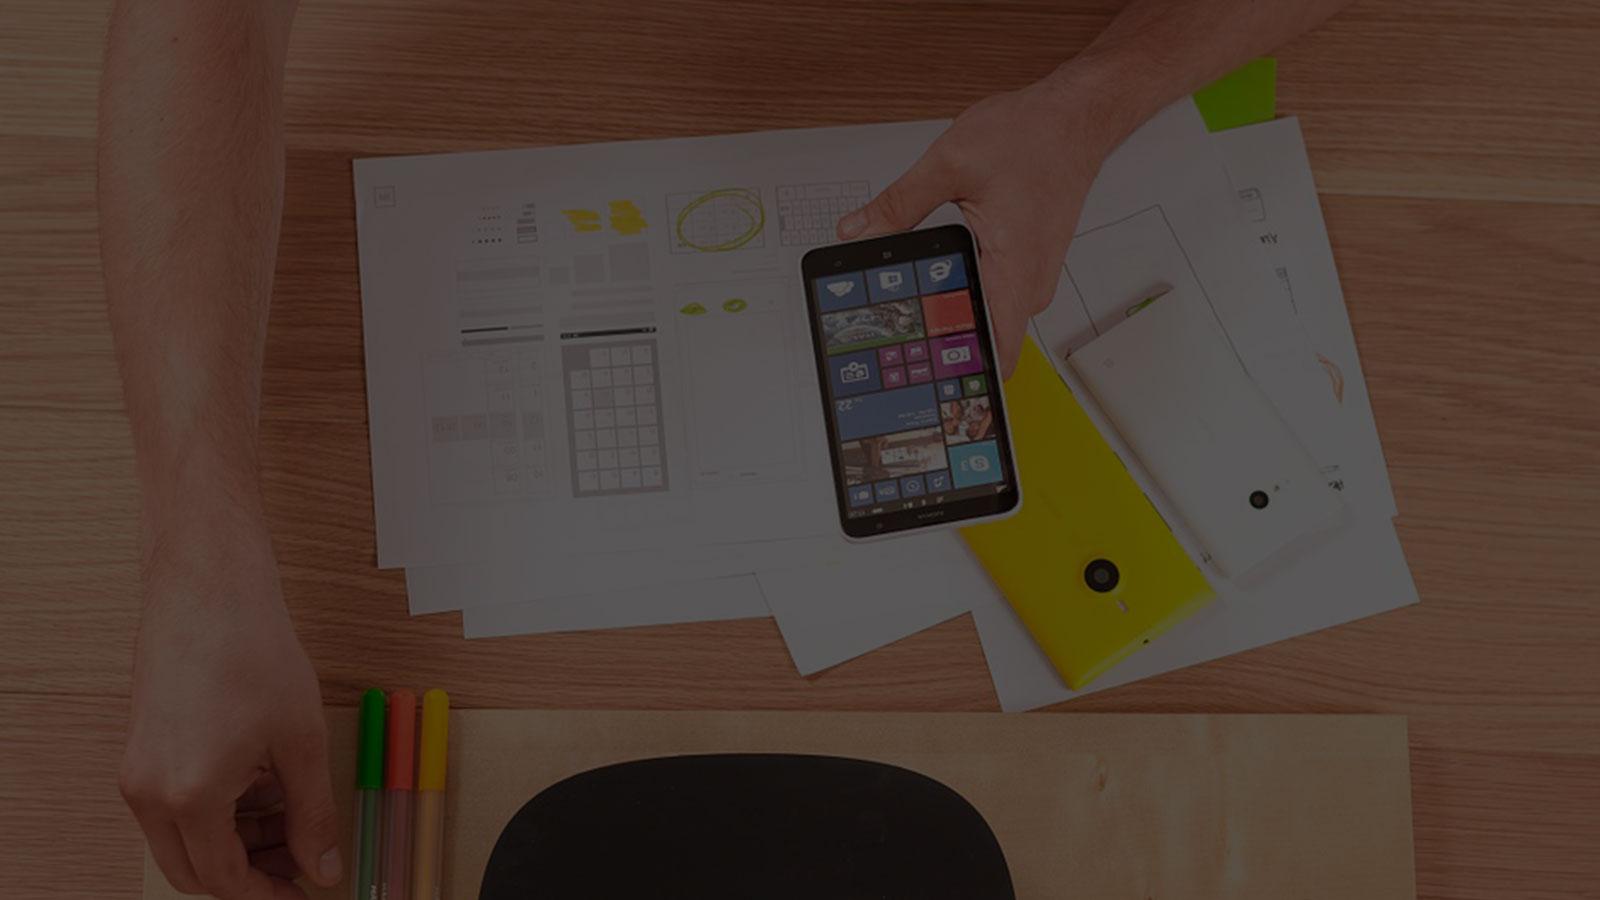 gerenciamento de dispositivos móveis corporativos